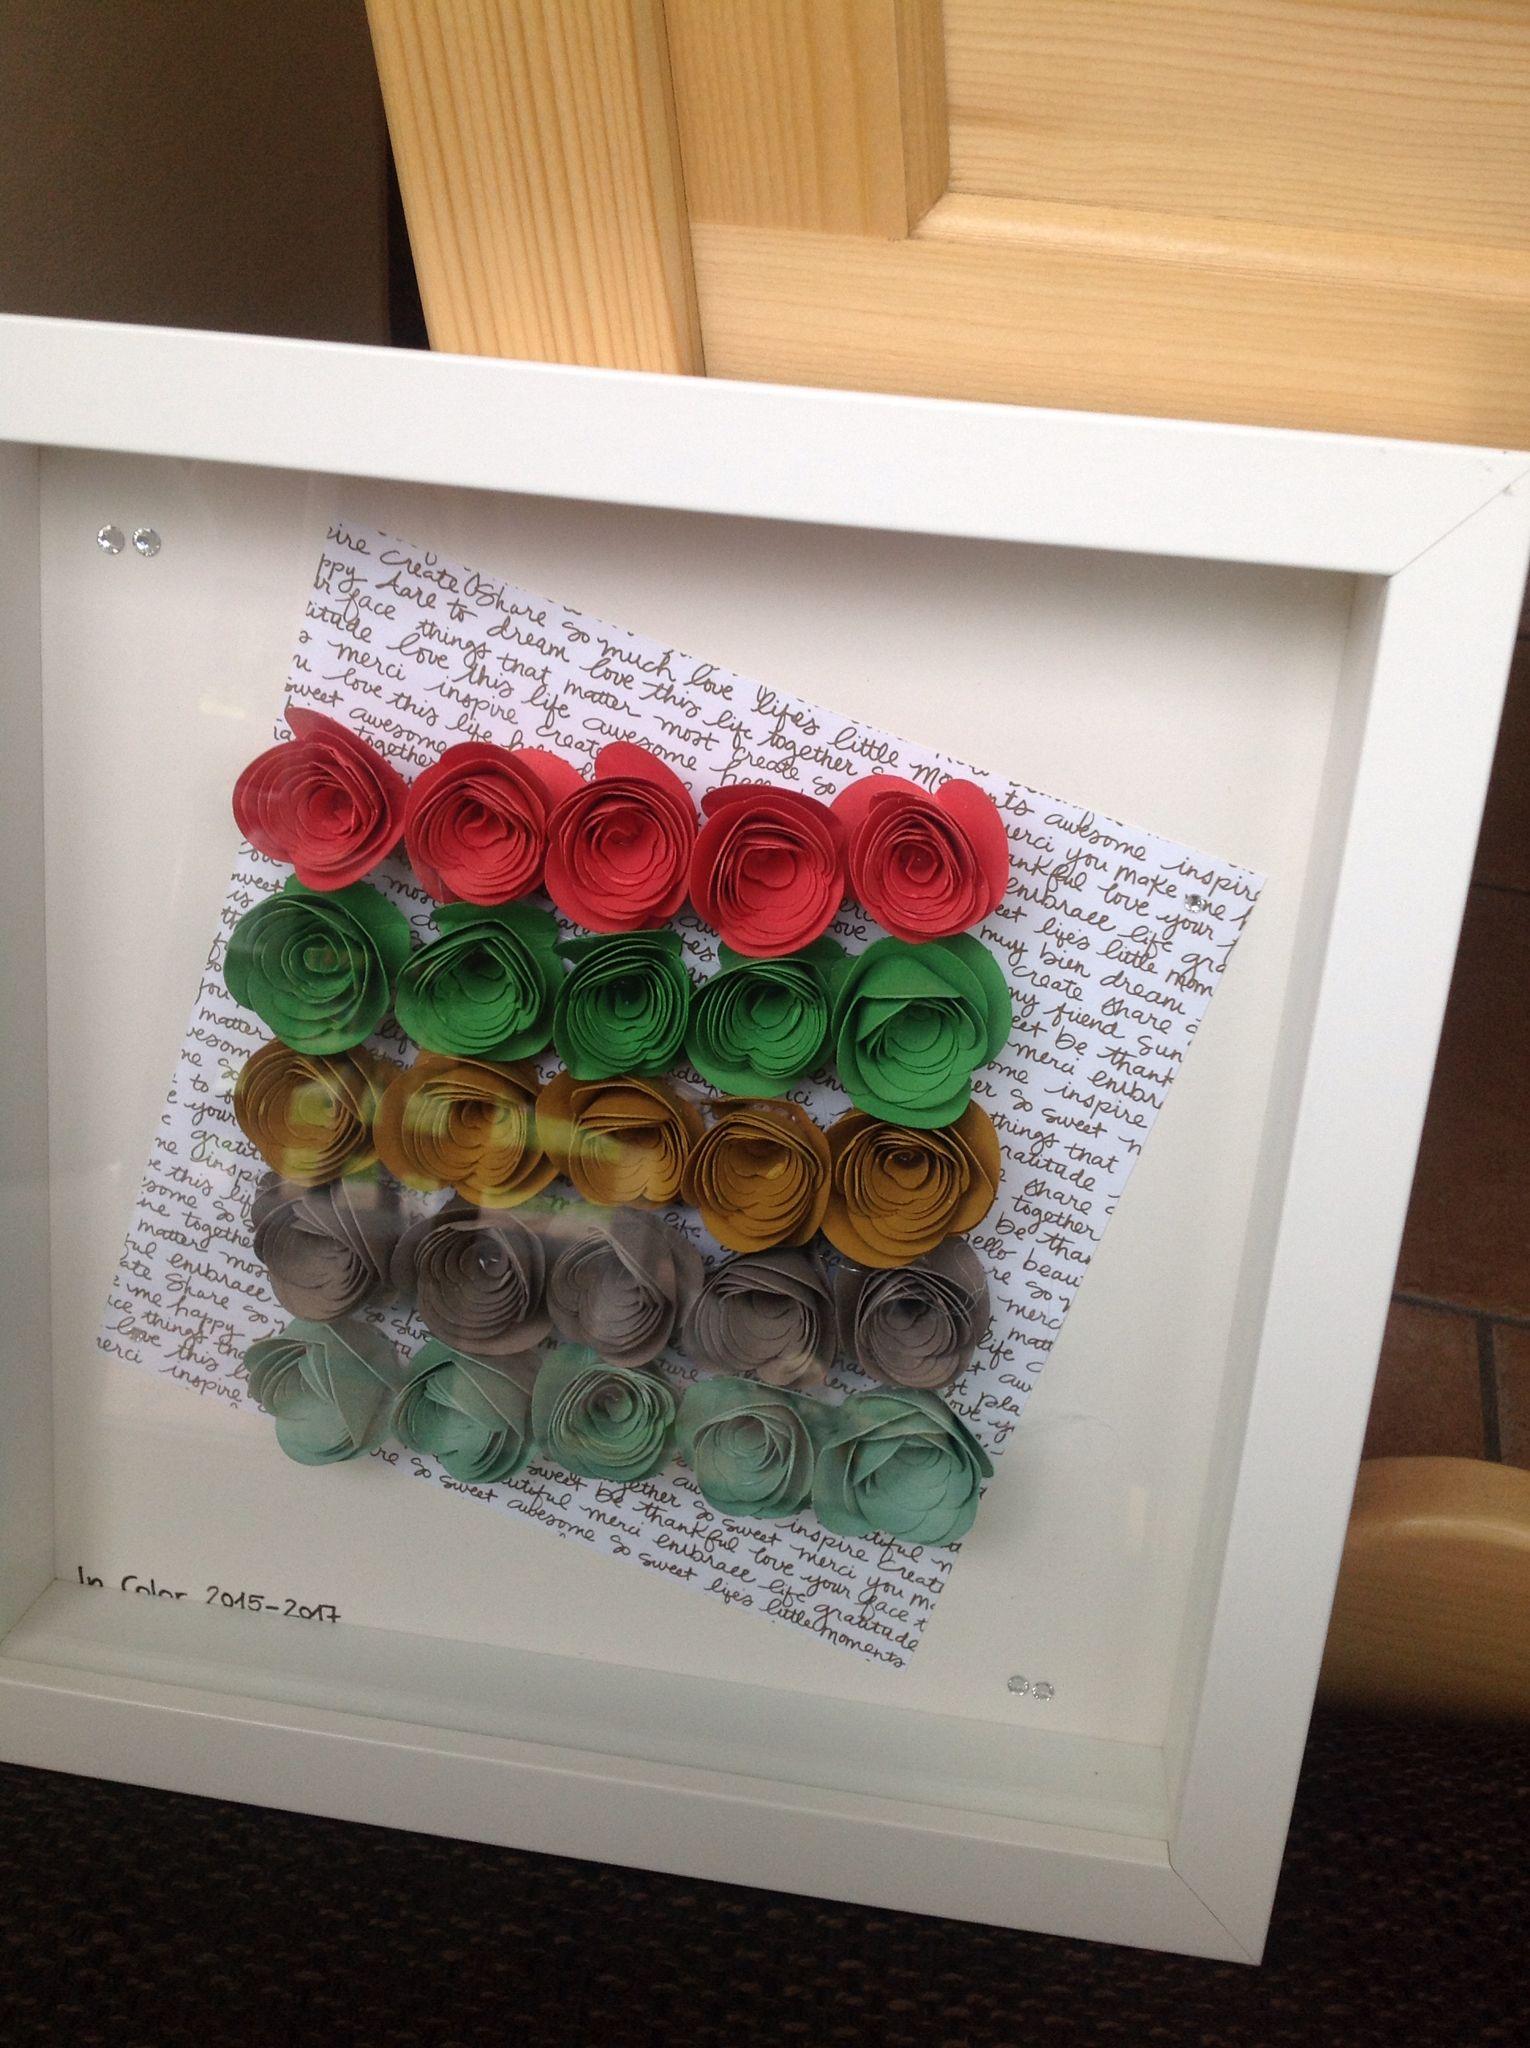 Neue In Color 2015-2017, Spiralblume, neues Designpapier, Riba